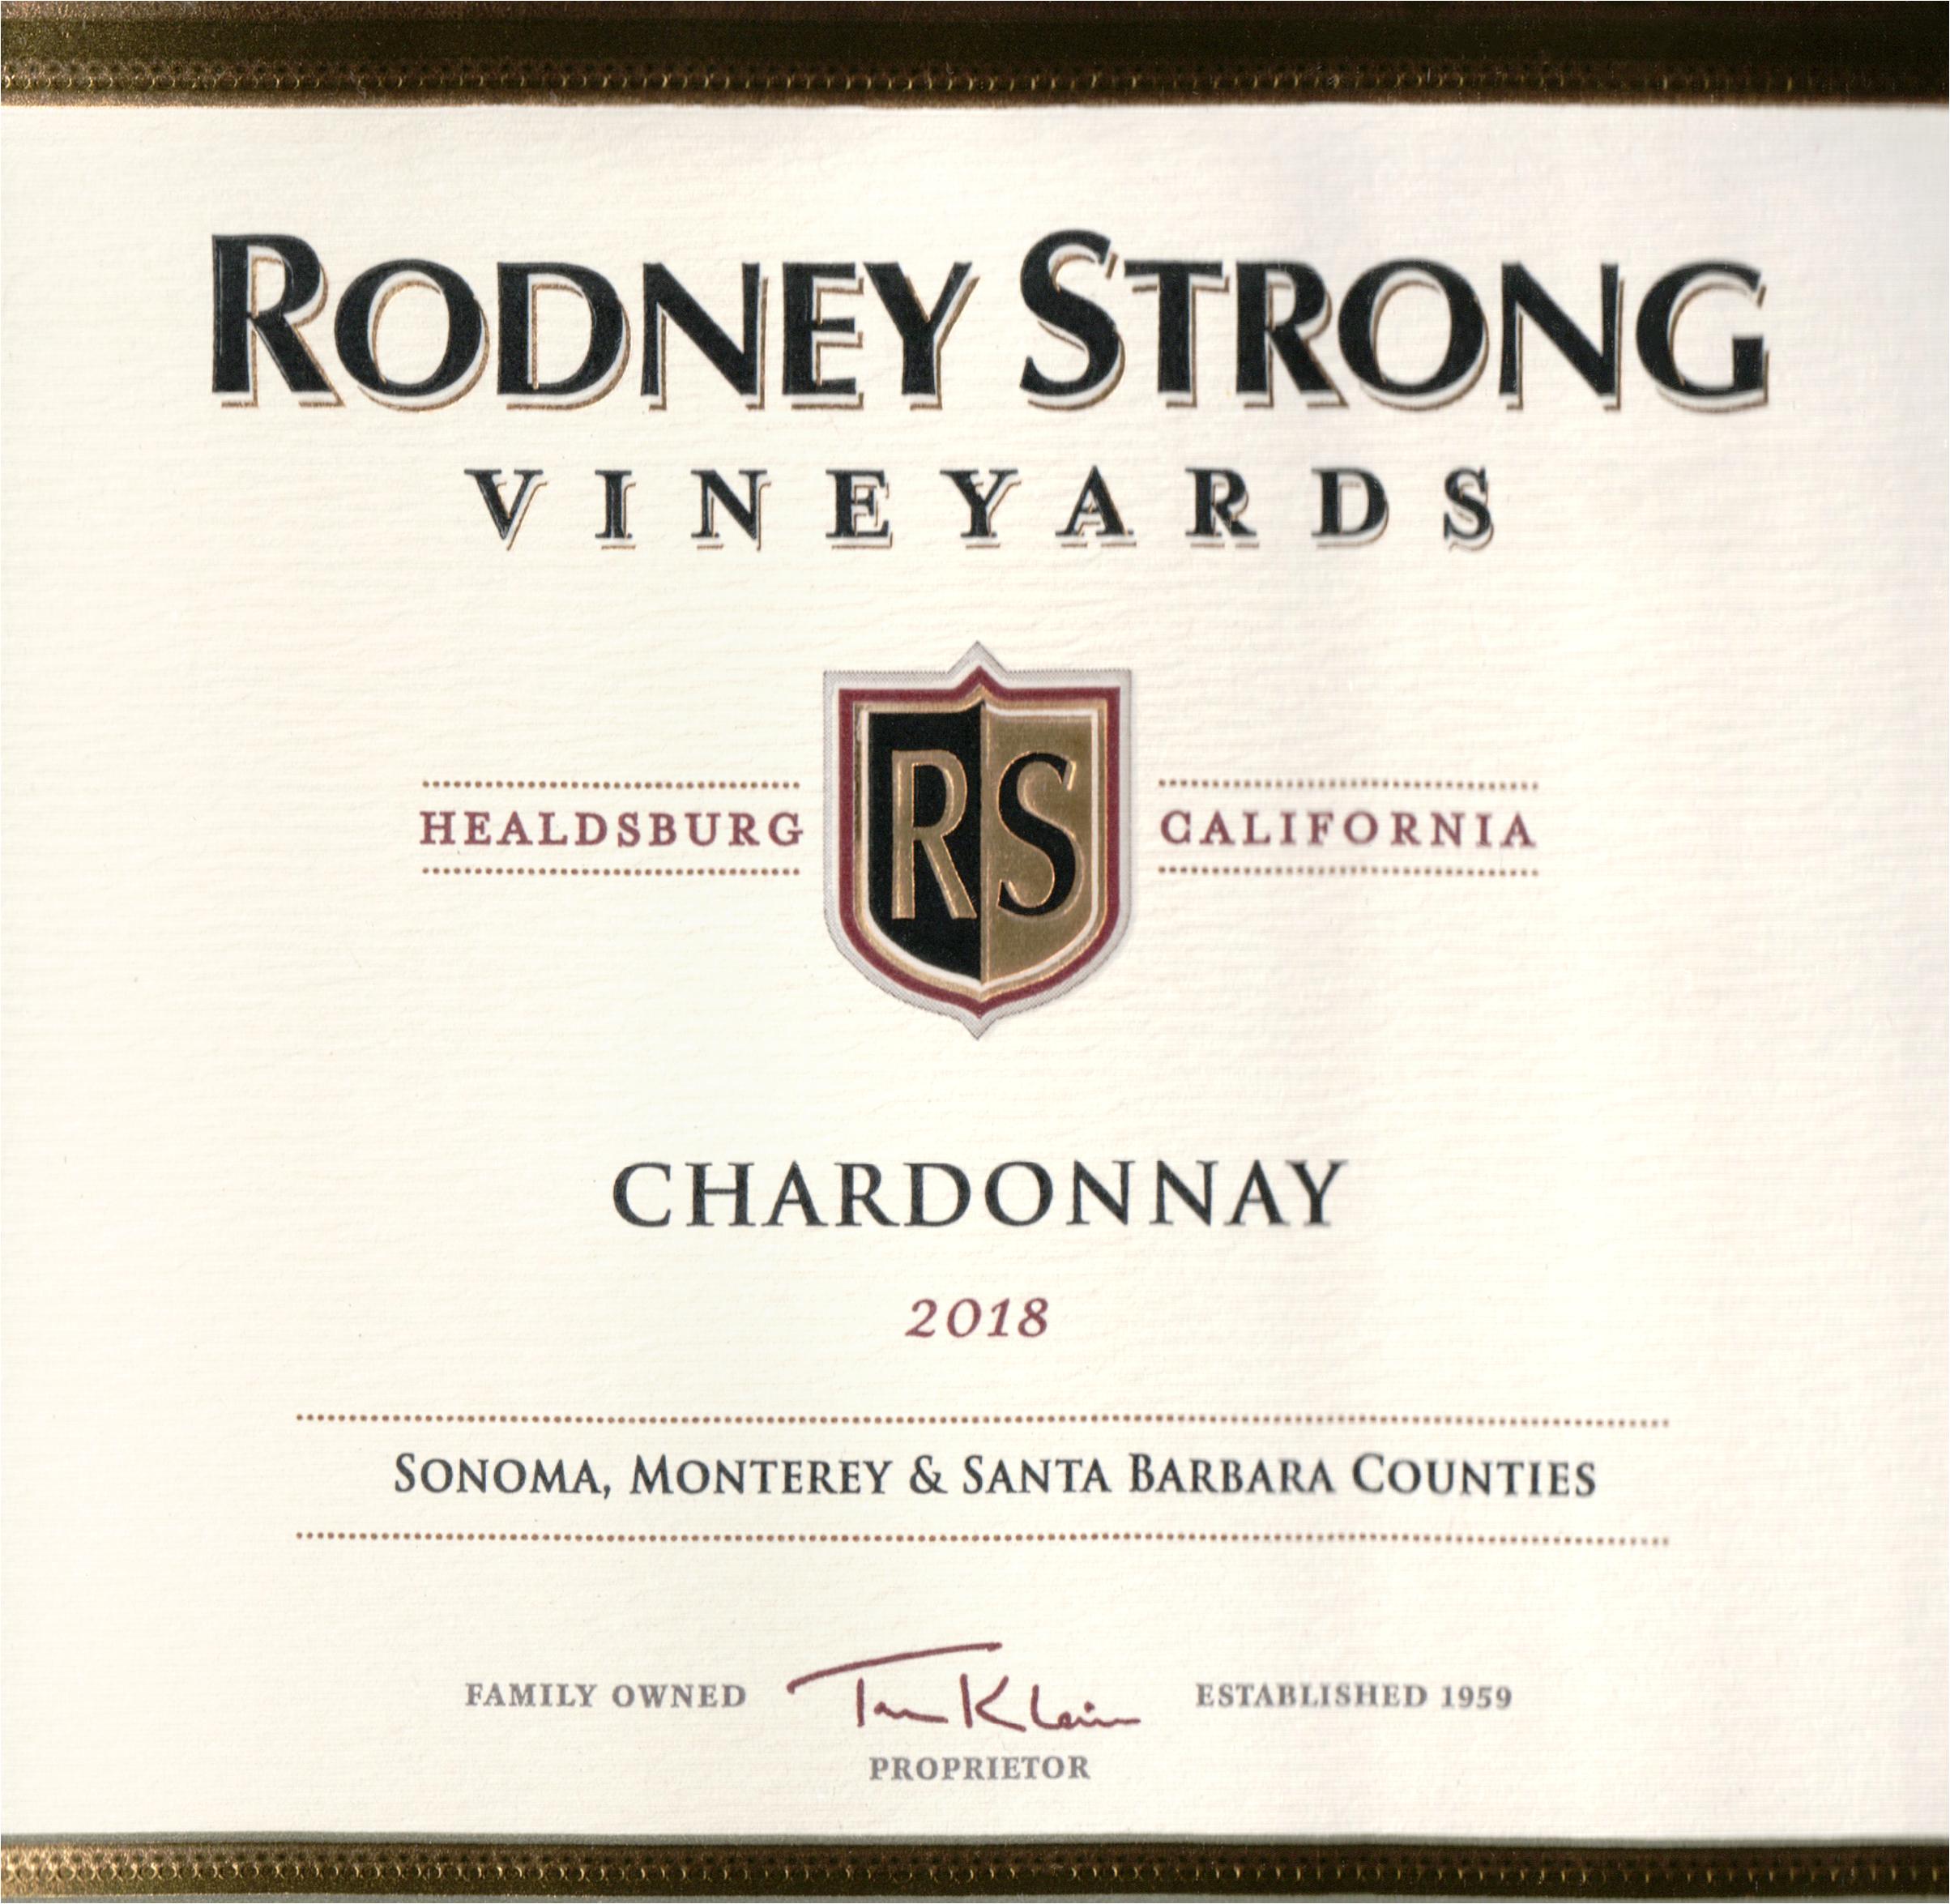 Rodney Strong Chardonnay 2018